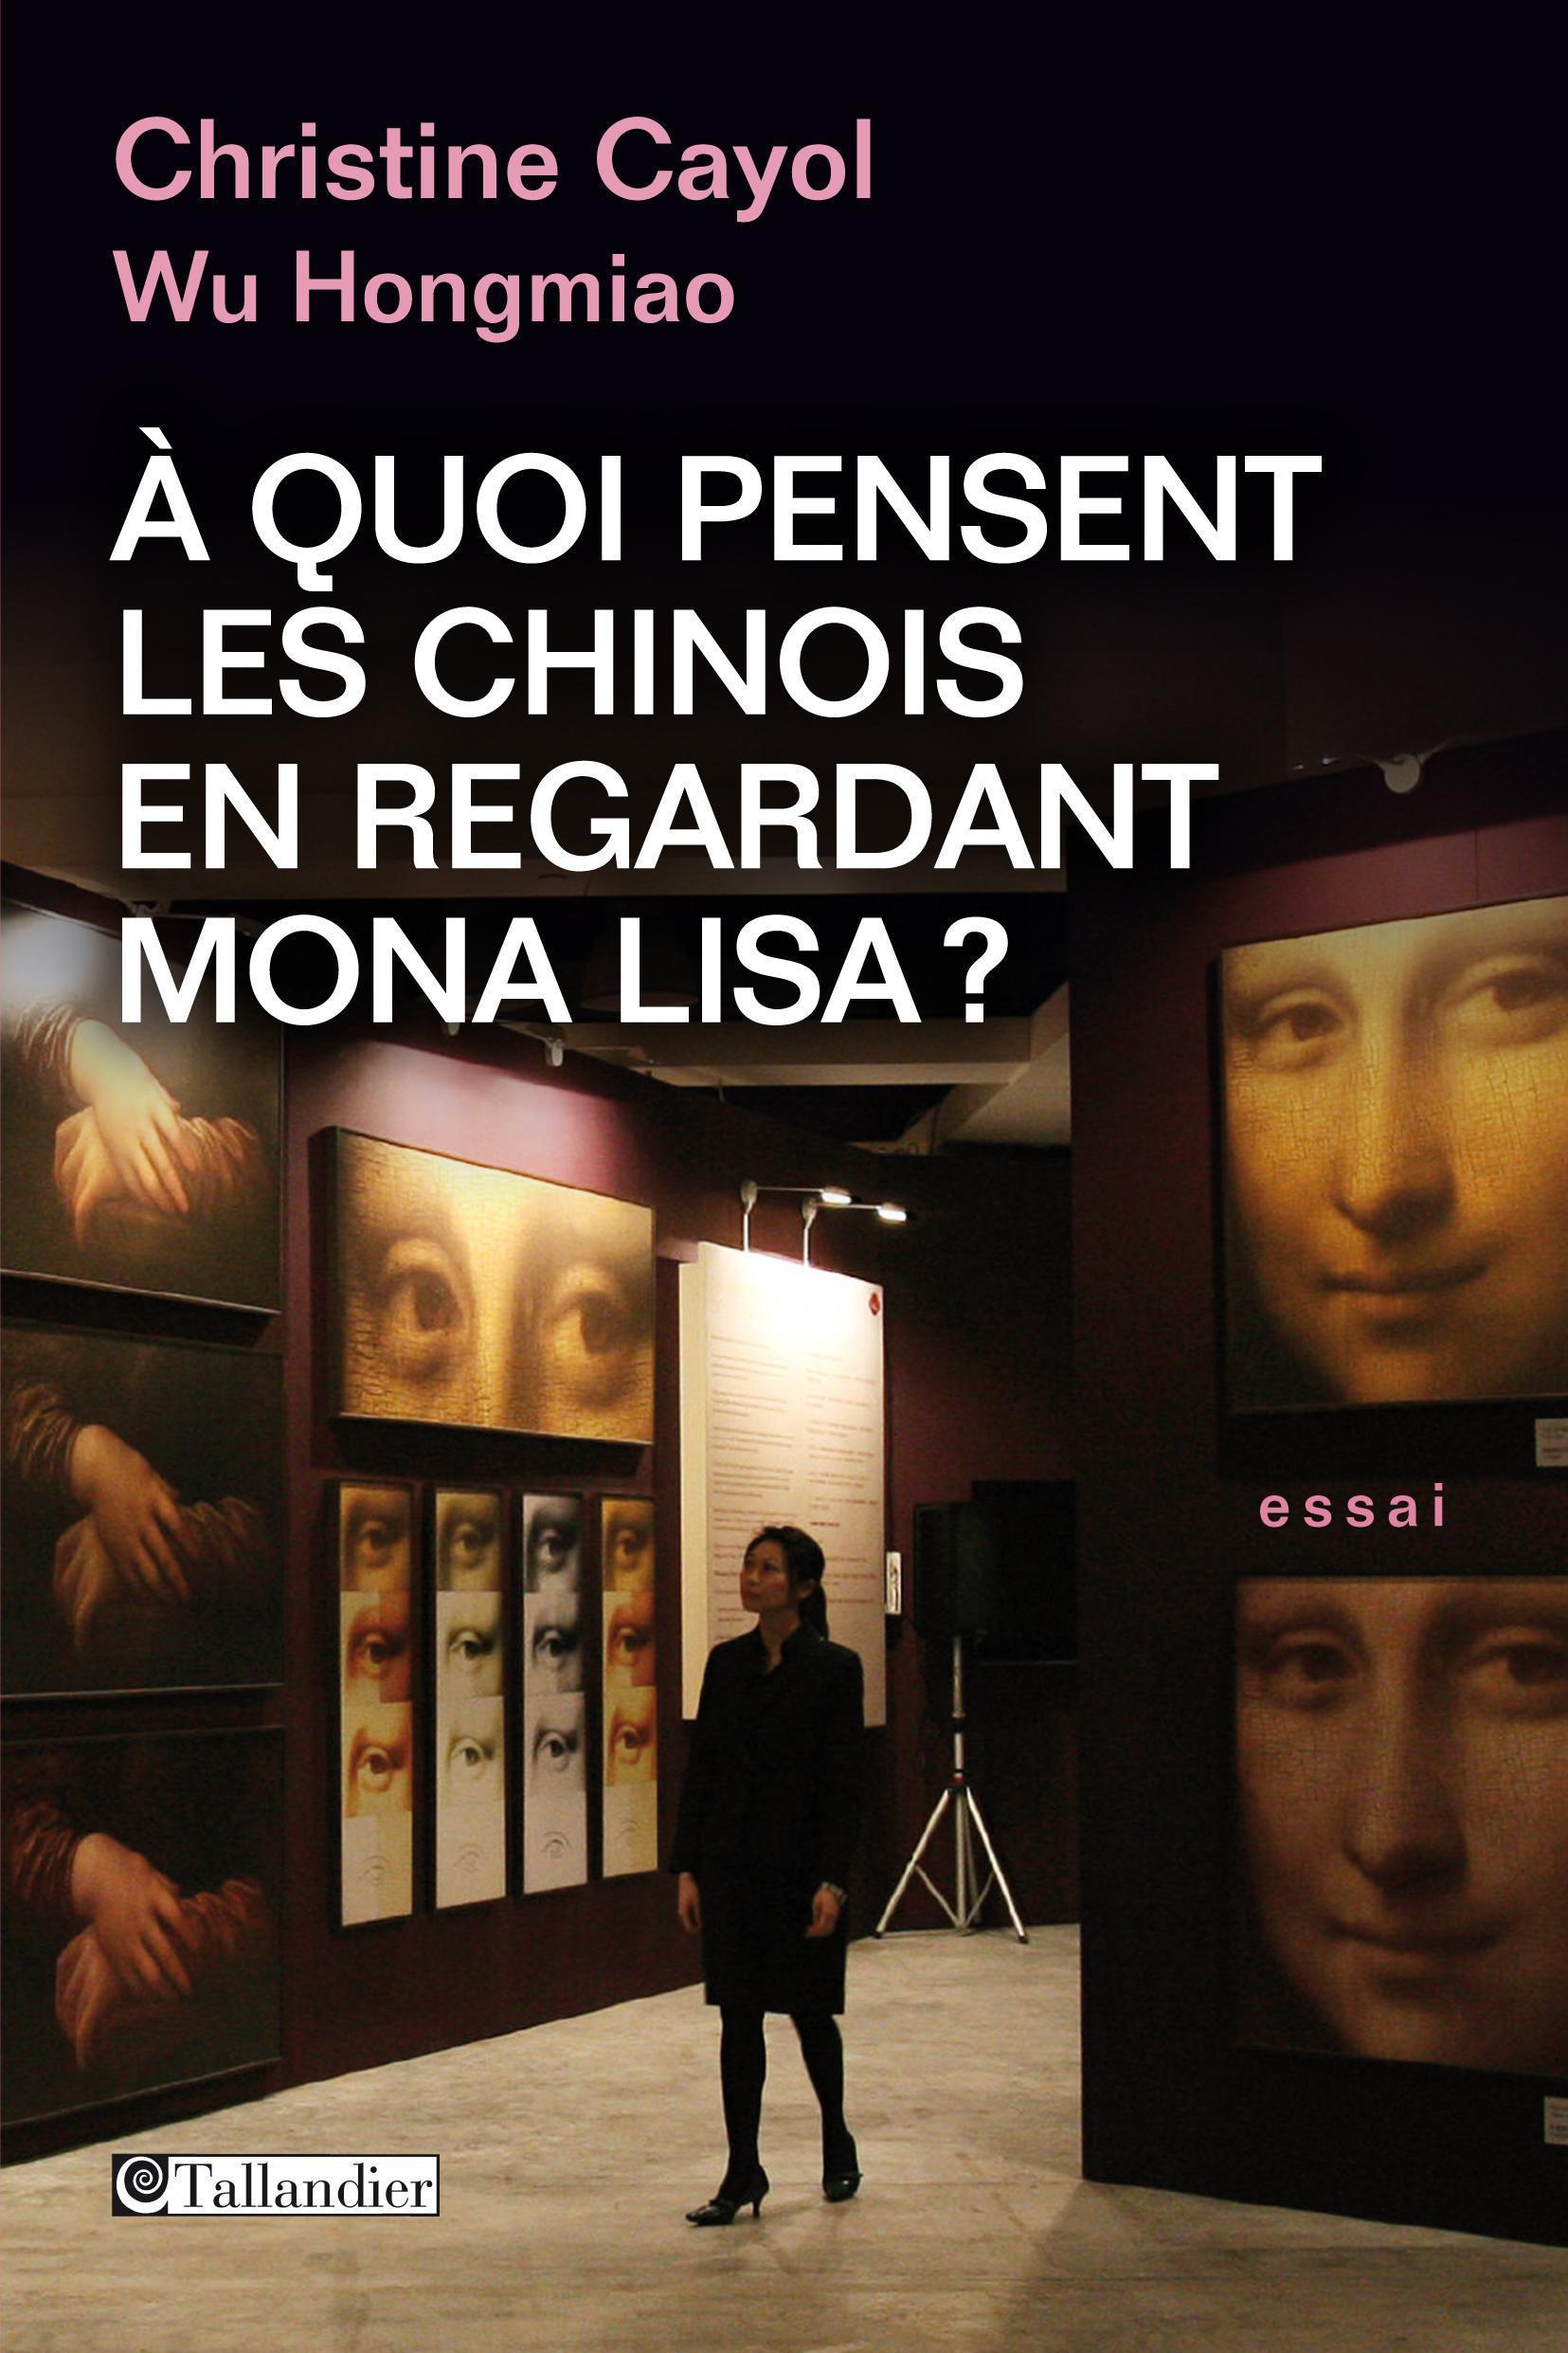 A quoi pensent les Chinois en regardant Mona Lisa?